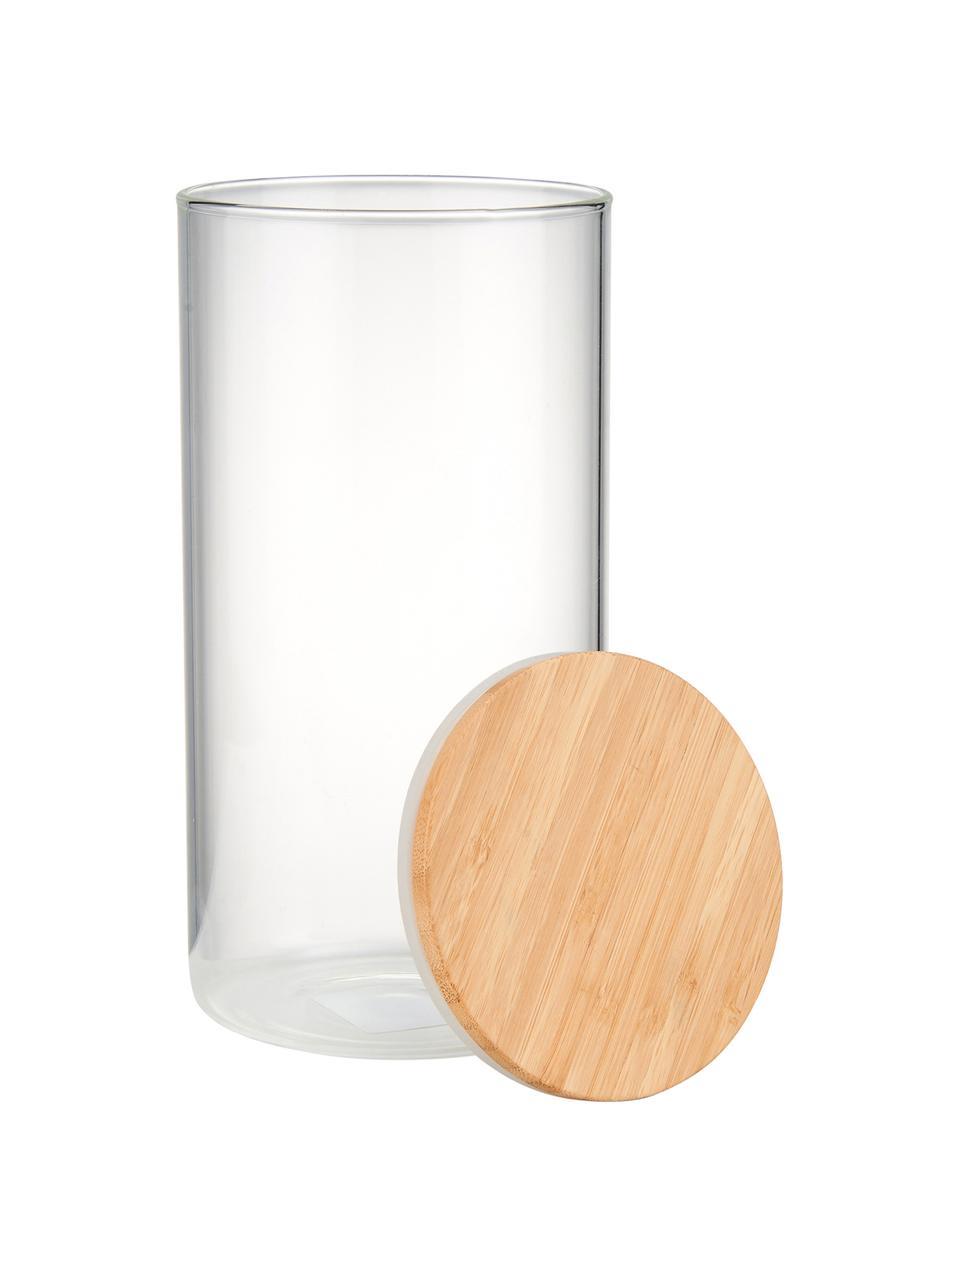 Aufbewahrungsdose Woodlock mit Deckel aus Buchenholz, Dose: Glas, Deckel: Buchenholz, Transparent, Buchenholz, Ø 11 x H 28 cm